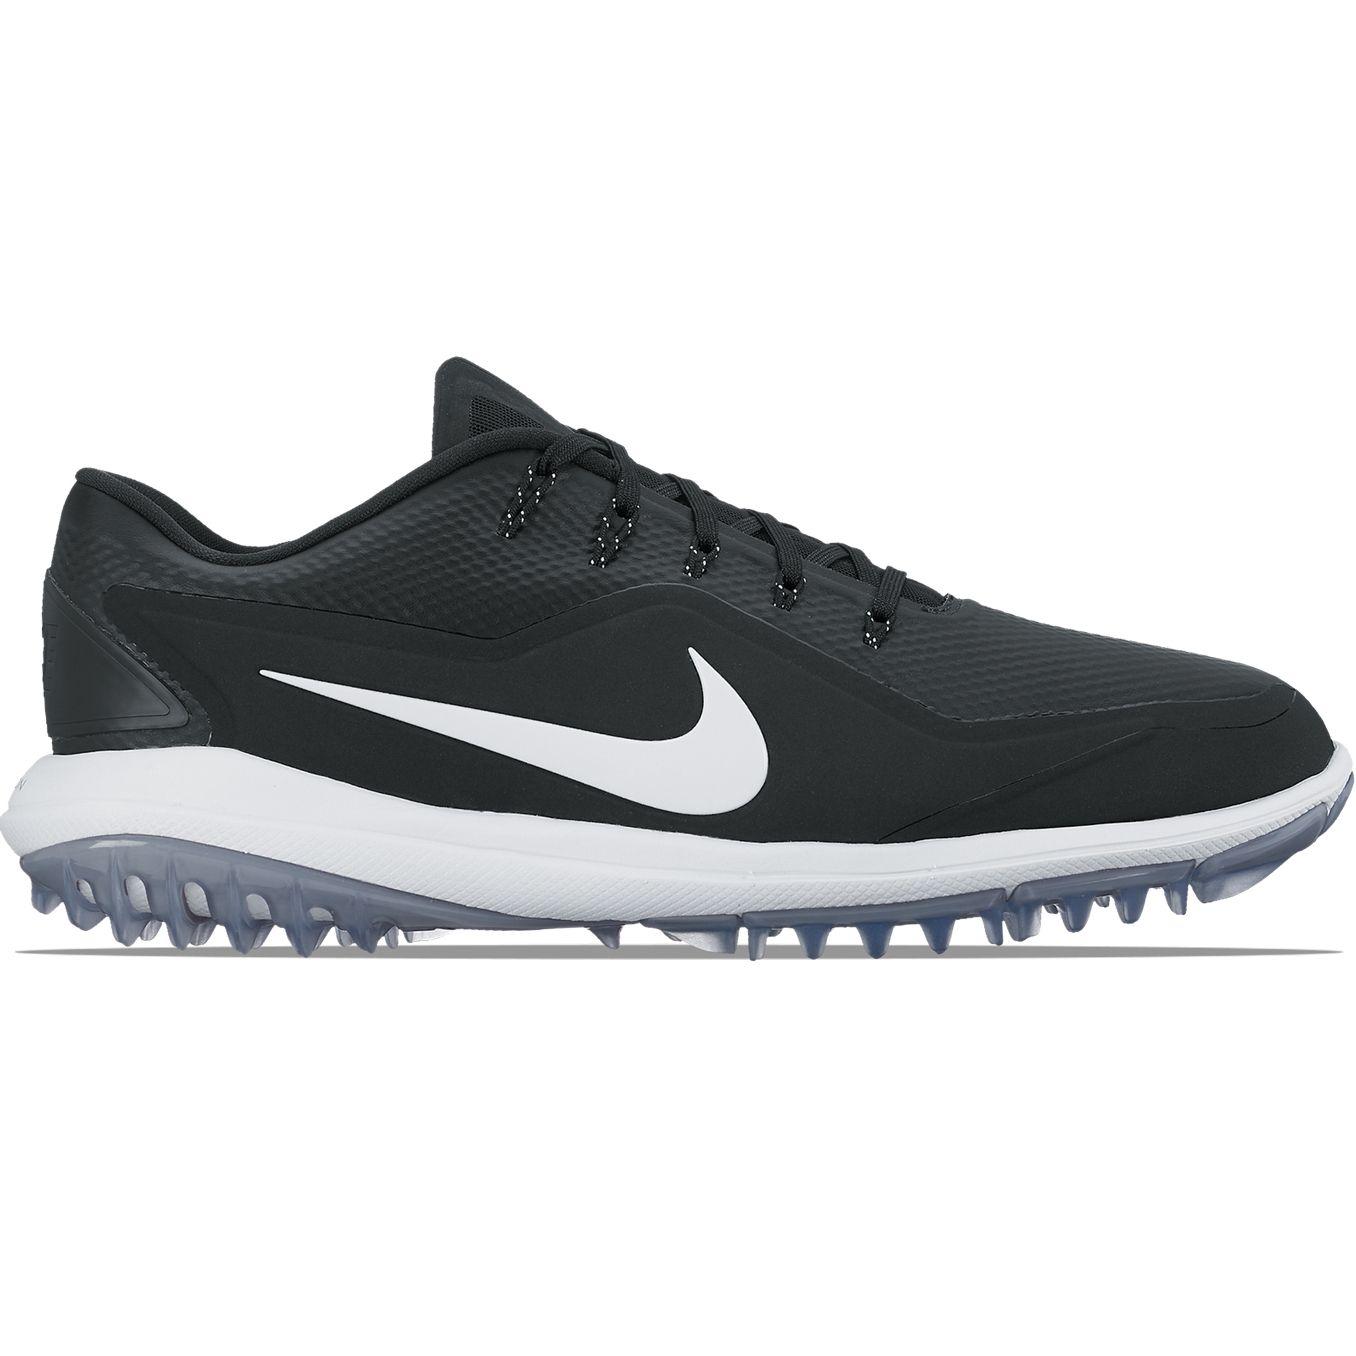 nike lunarlon golf shoes 2018